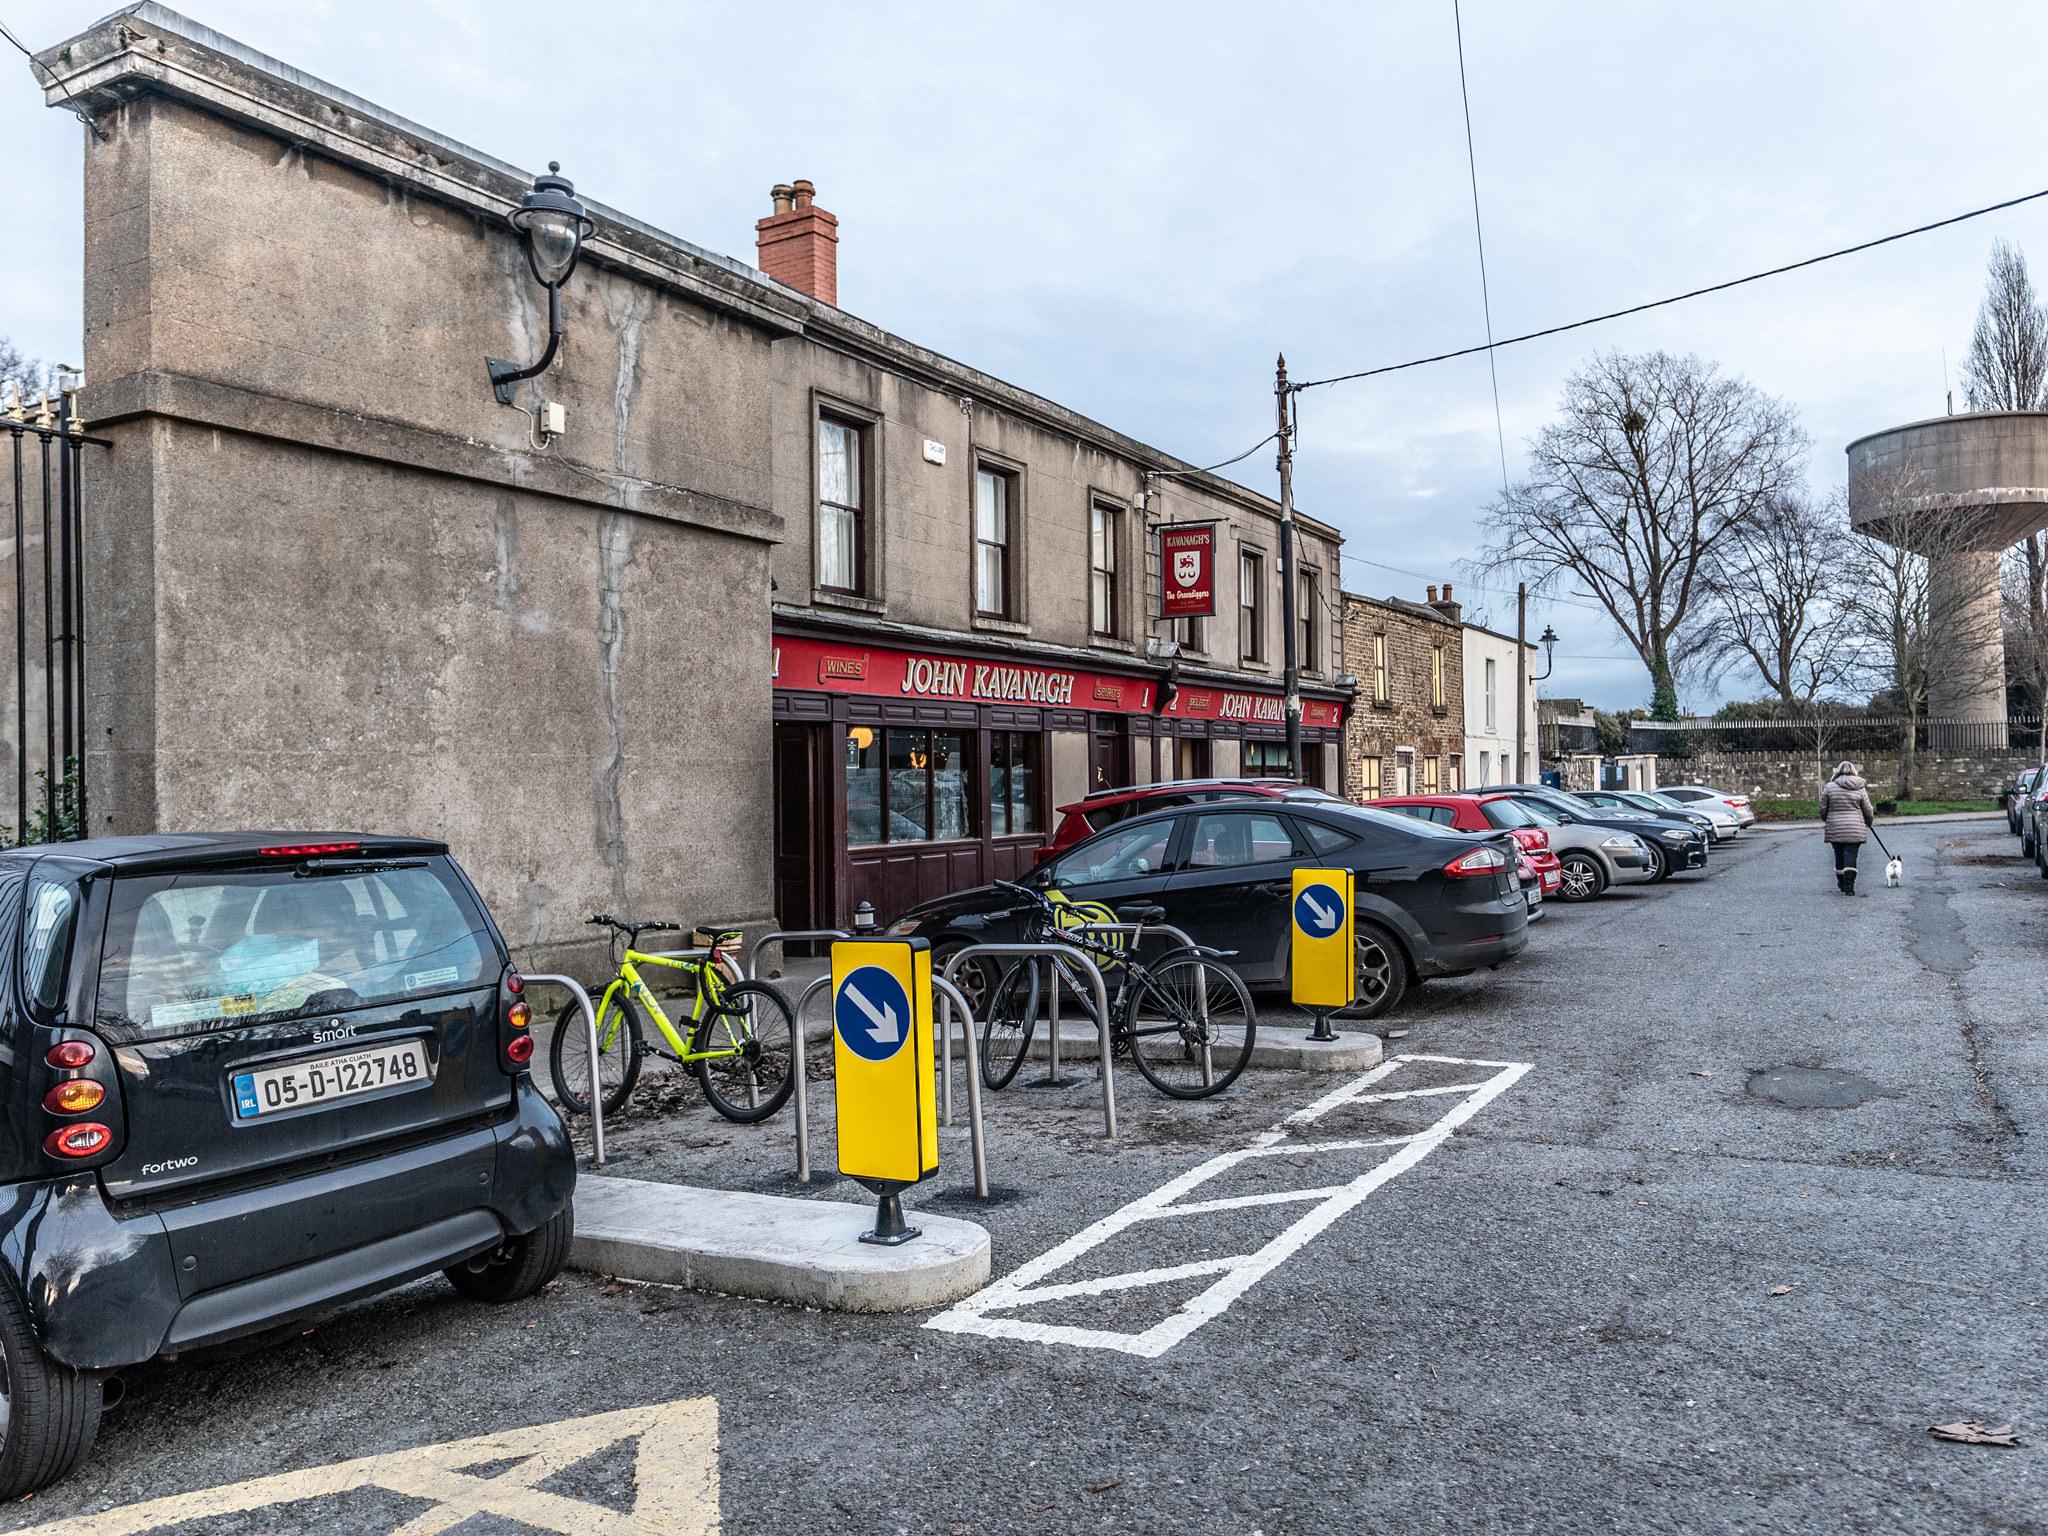 The exterior of Gravediggers pub in Dublin